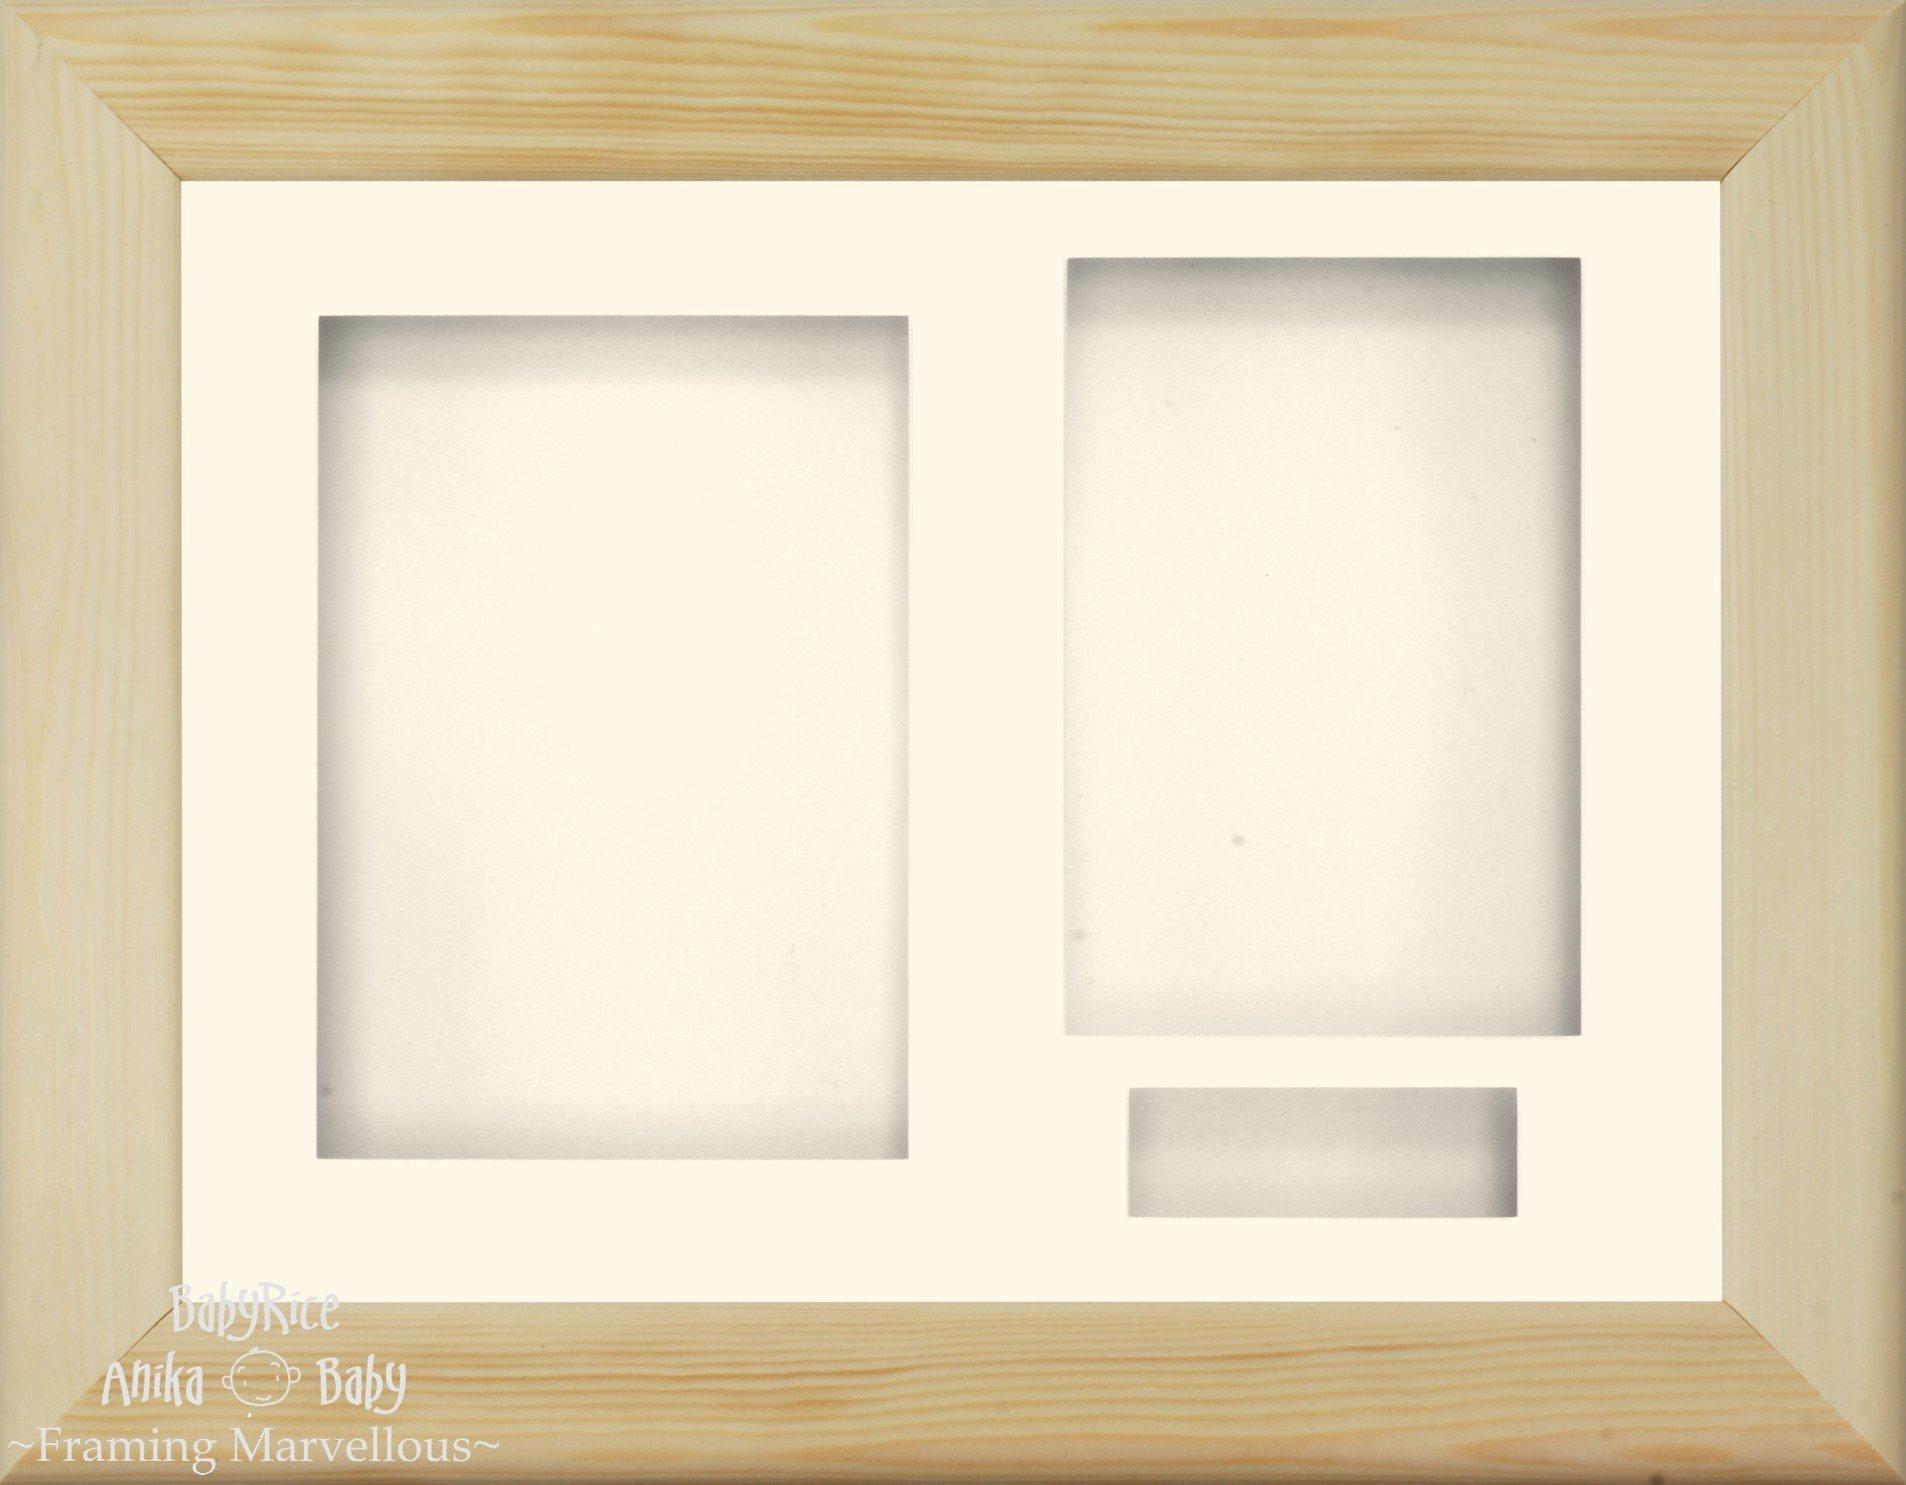 BabyRice 11.5x8.5'' Solid Oak Wood 3D Display Frame / Cream 3 hole mount & Backing by Anika-Baby (Image #1)